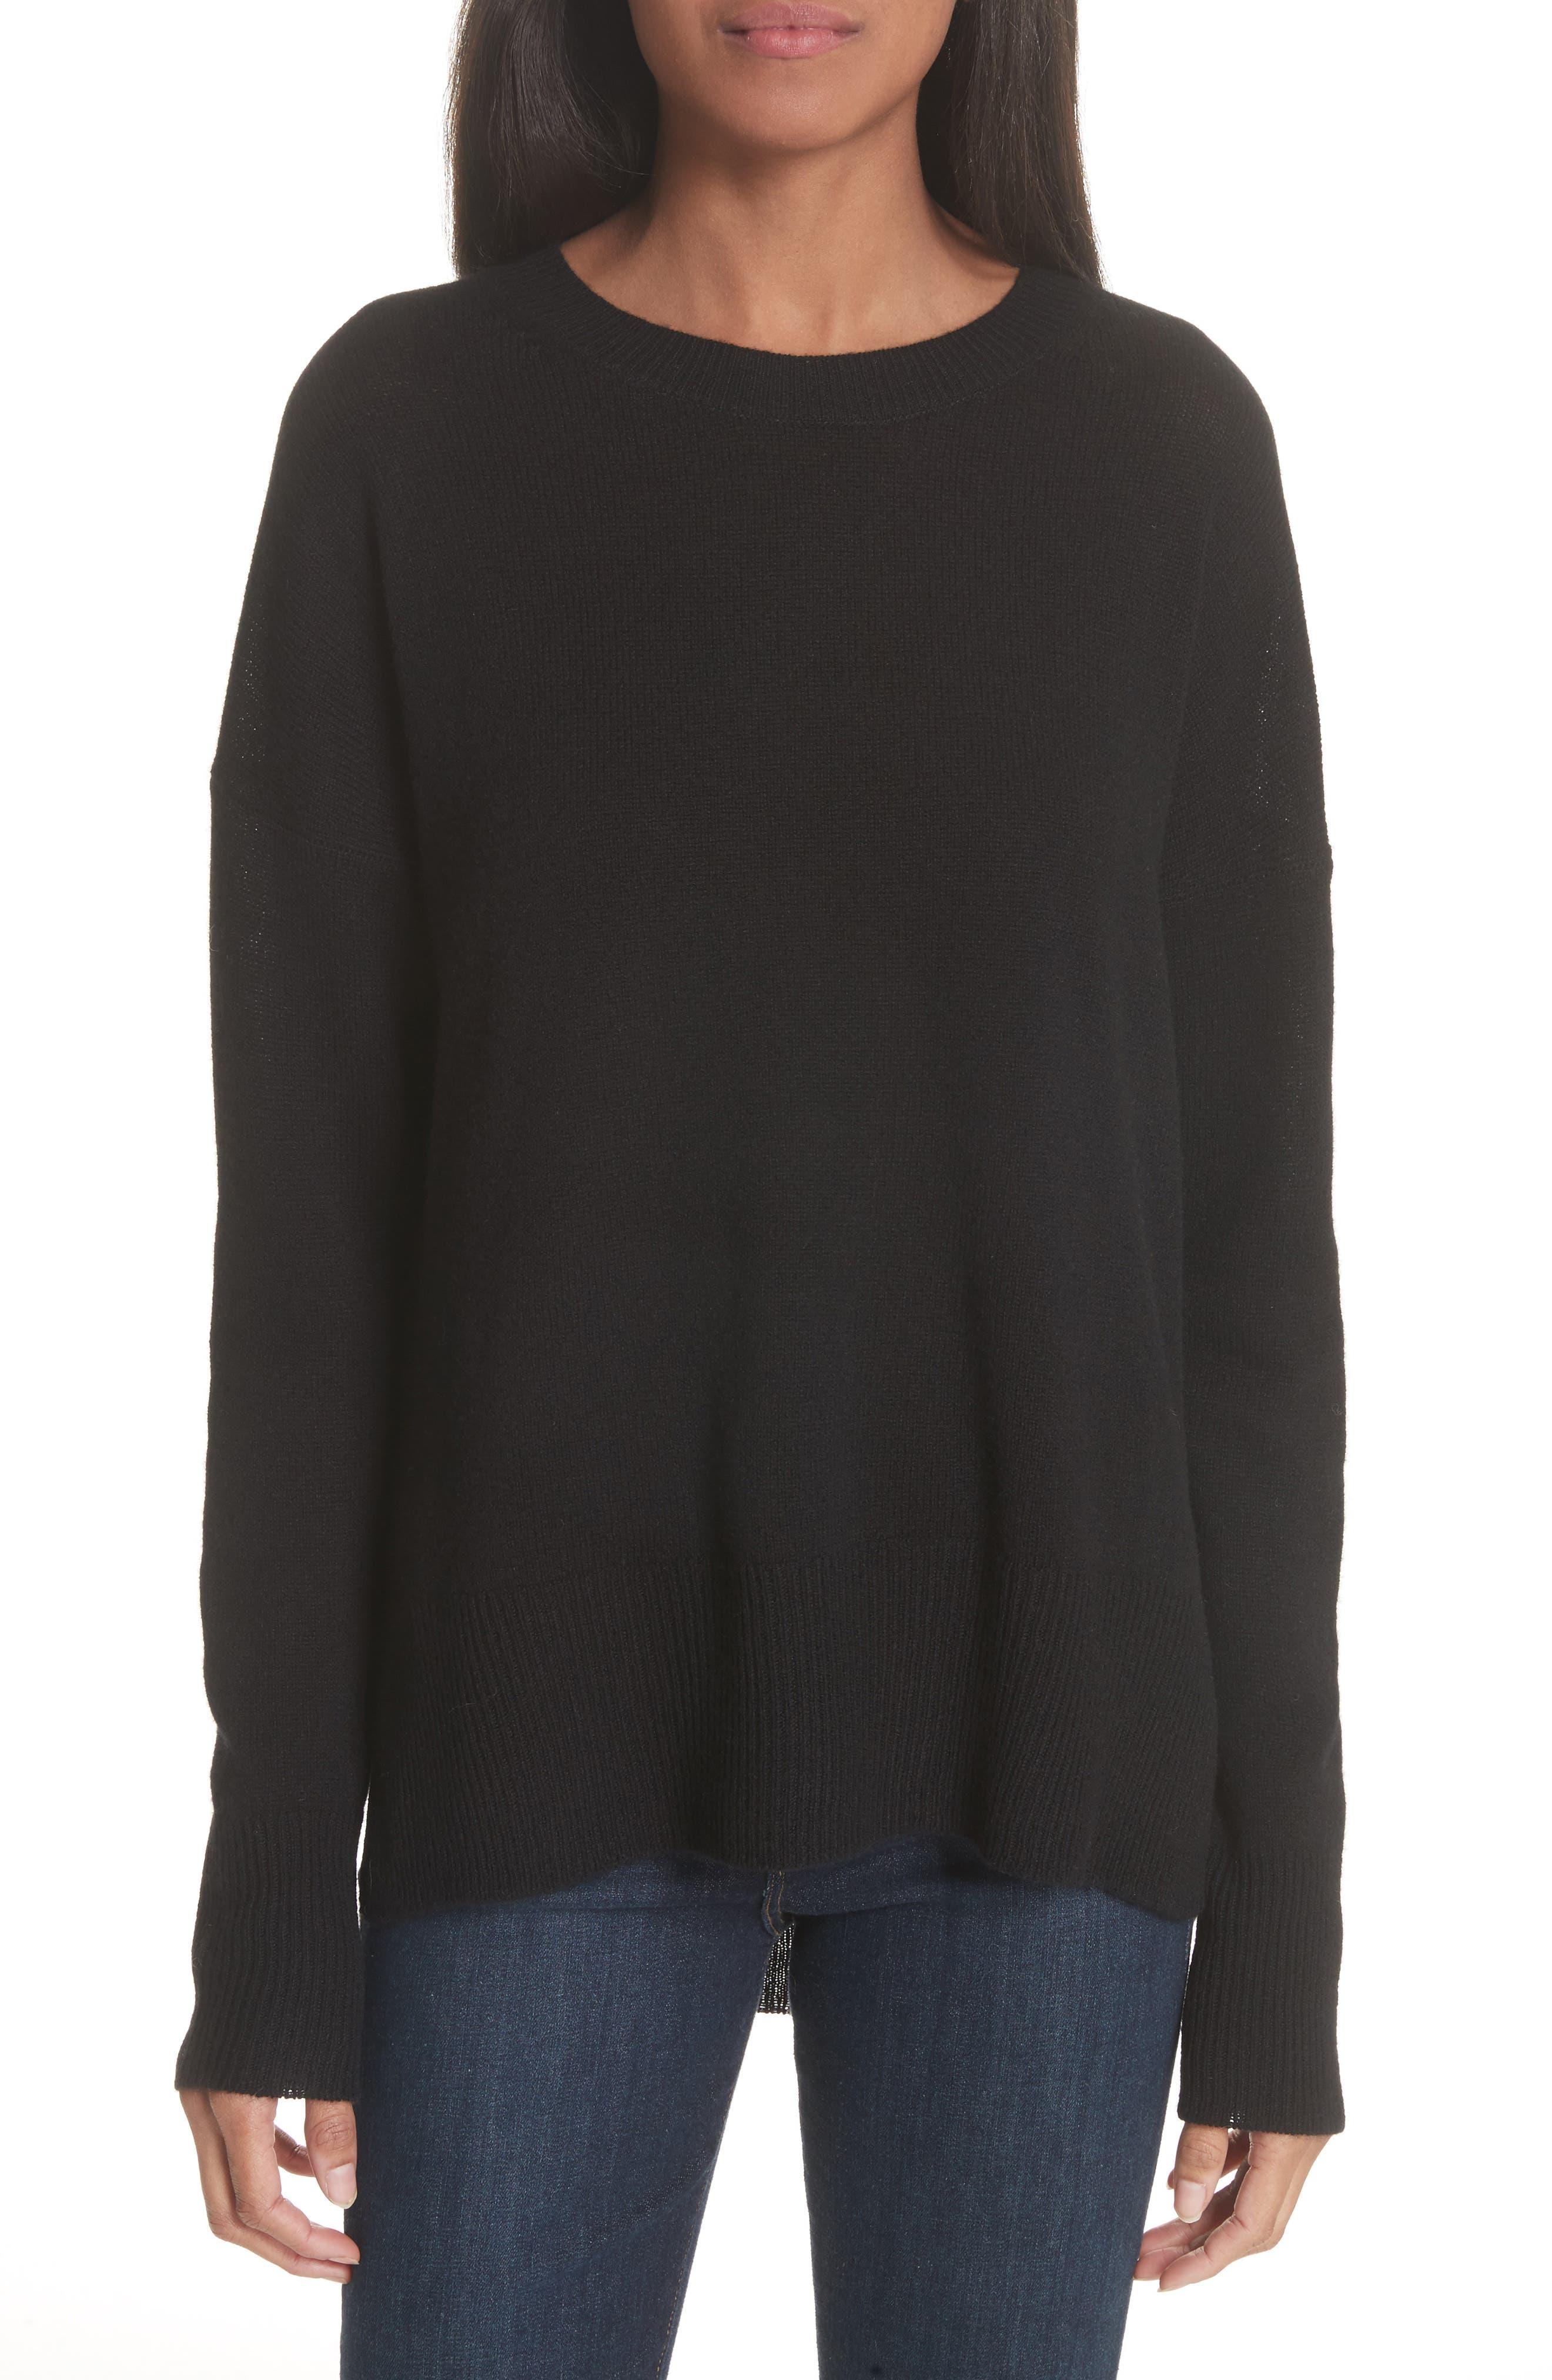 Karenia L Cashmere Sweater,                         Main,                         color, Black